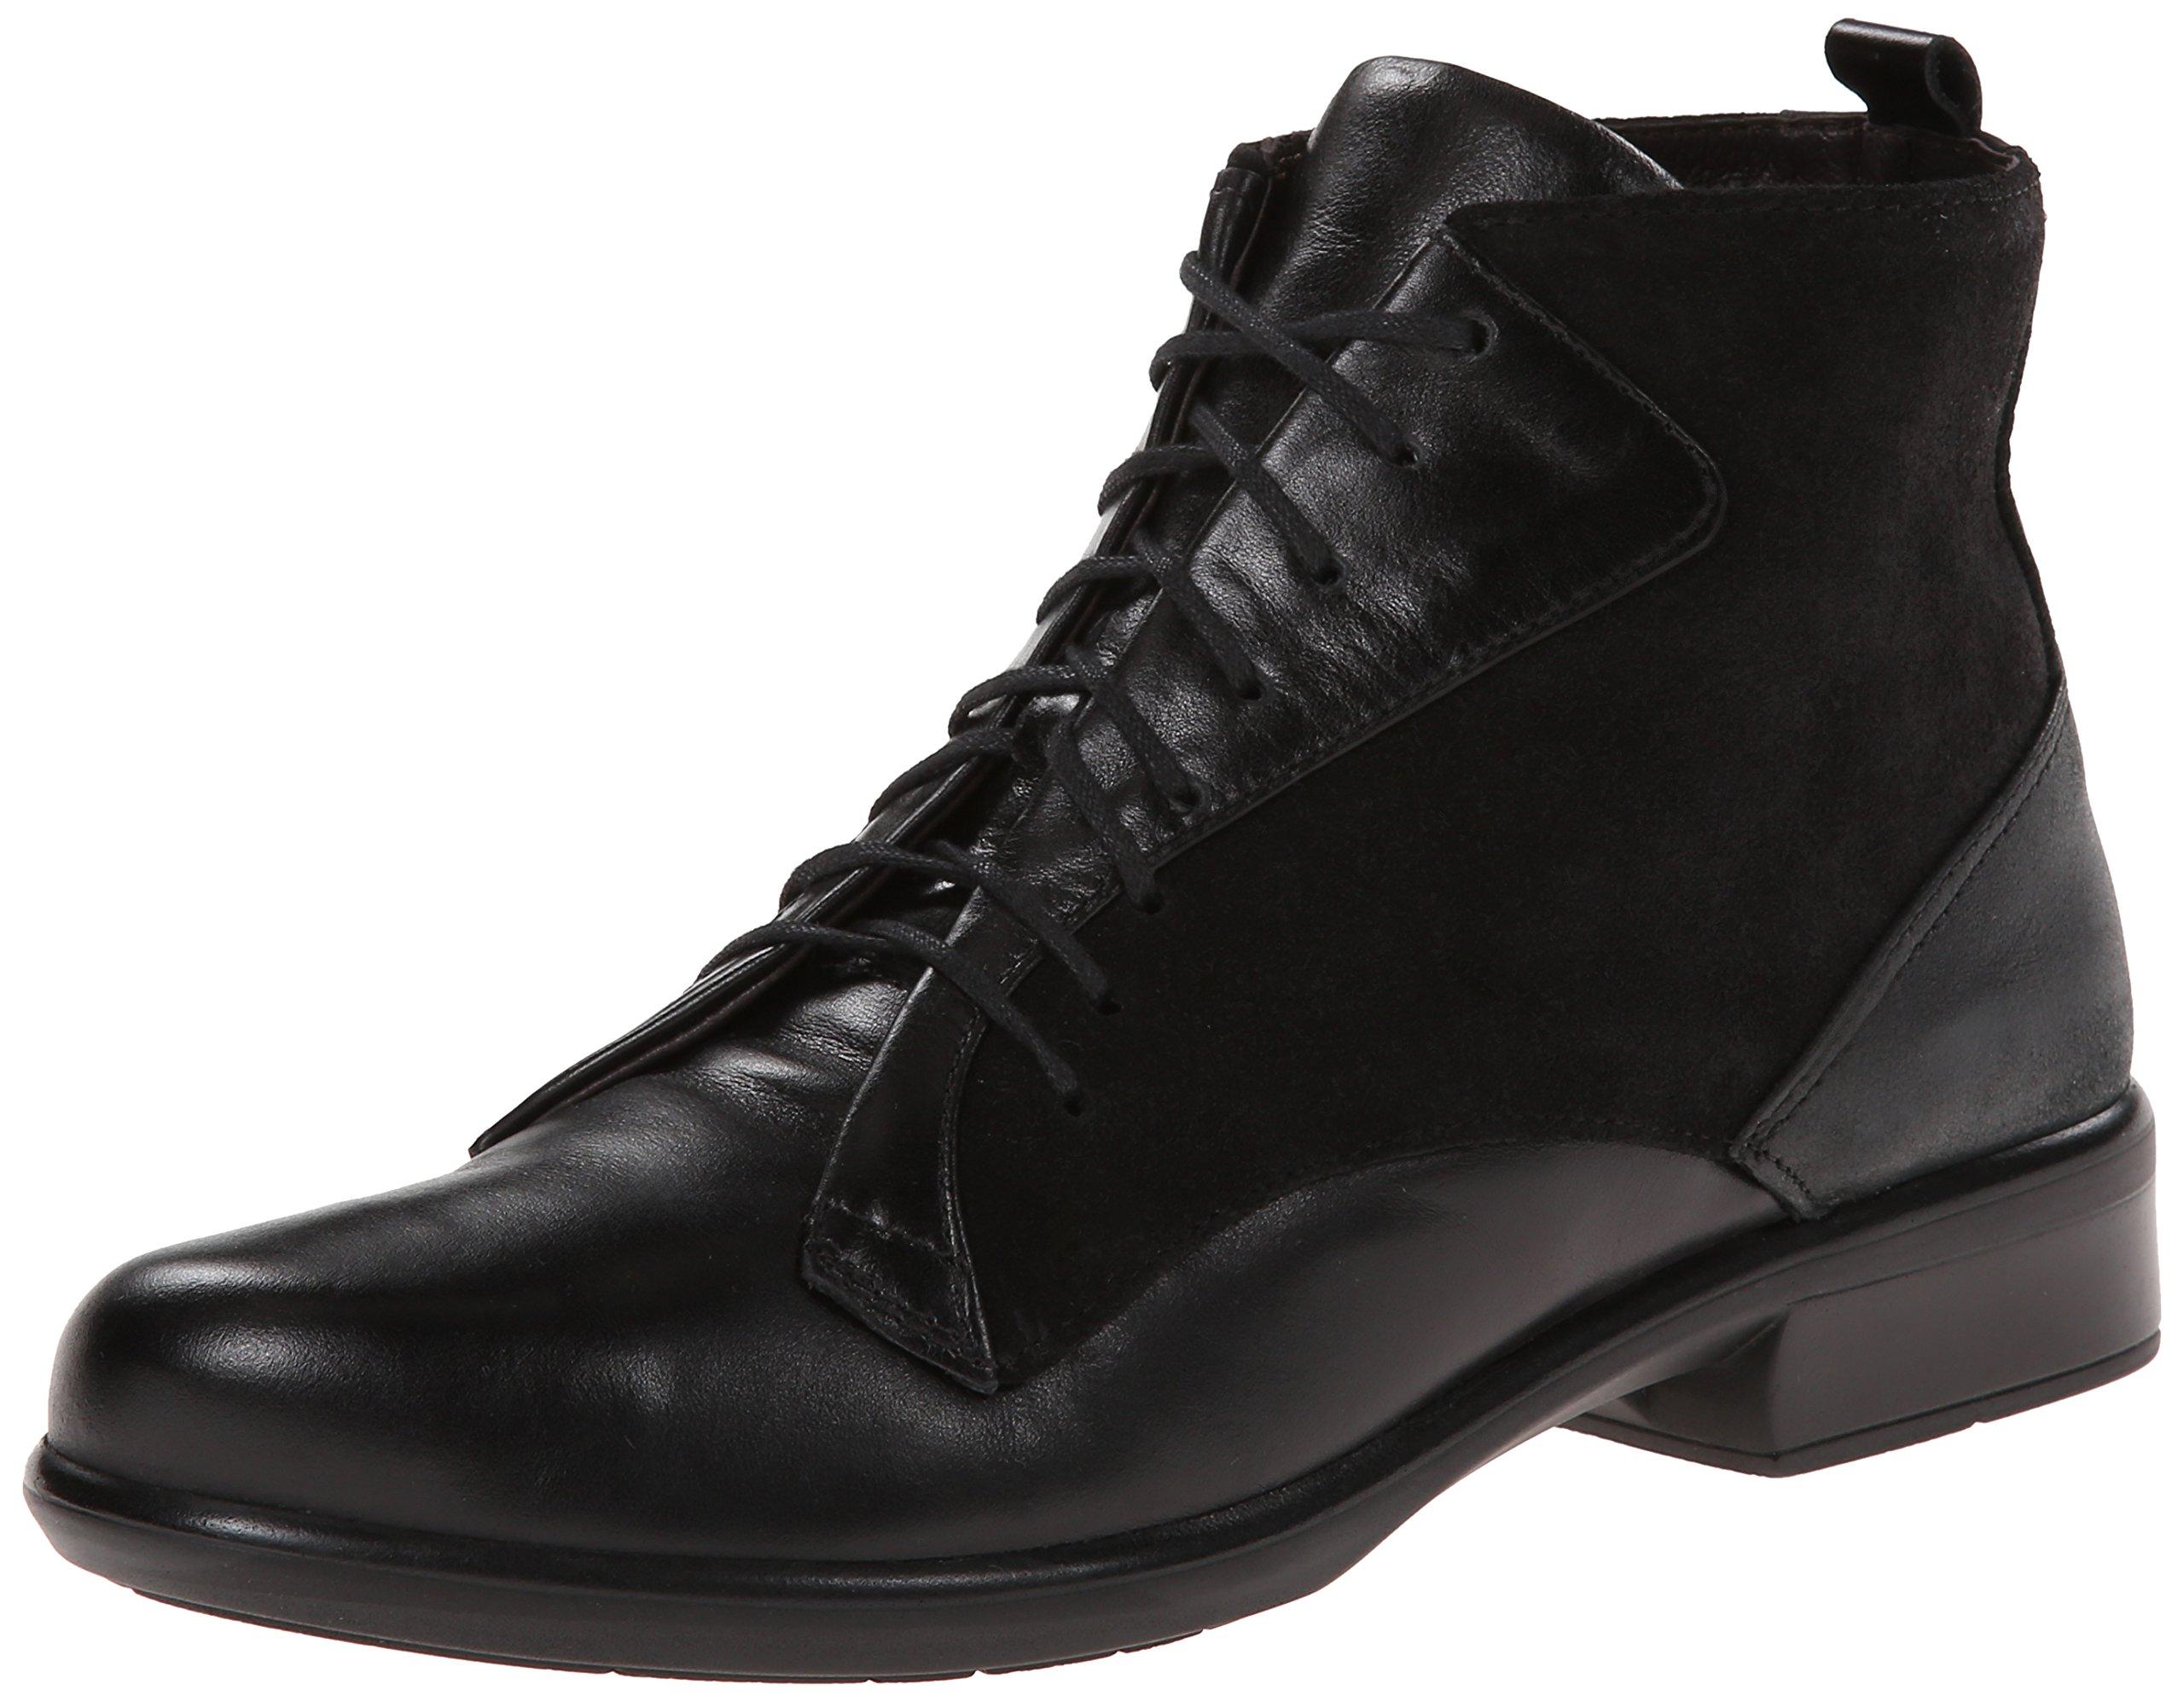 Naot Women's Mistral Boot, Black Madras/Black Shiny Leather, 38 EU/7 M US